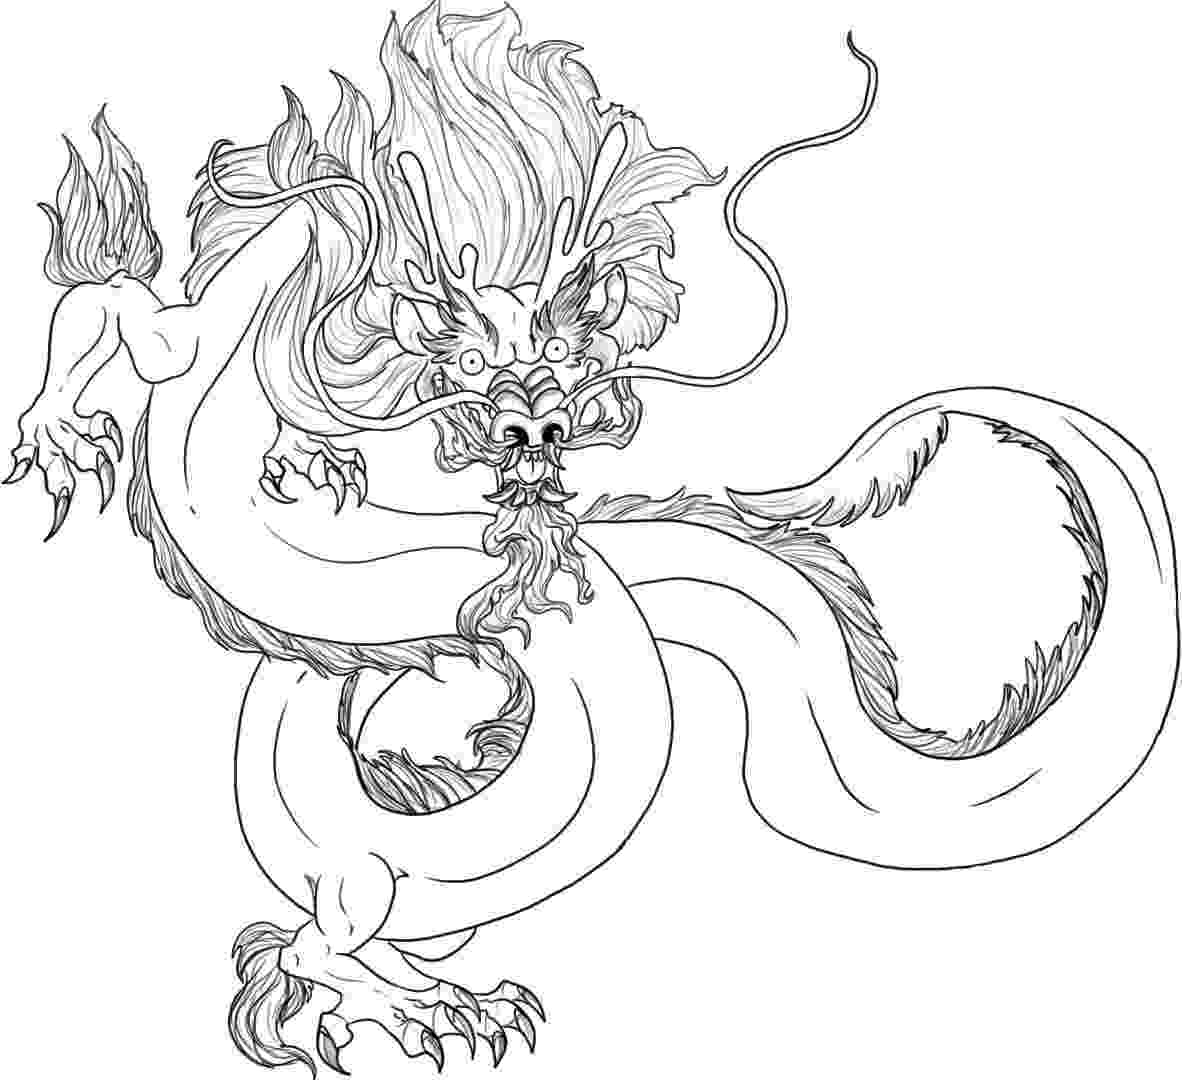 chinese dragon coloring sheet free printable chinese dragon coloring pages for kids dragon sheet chinese coloring 1 1